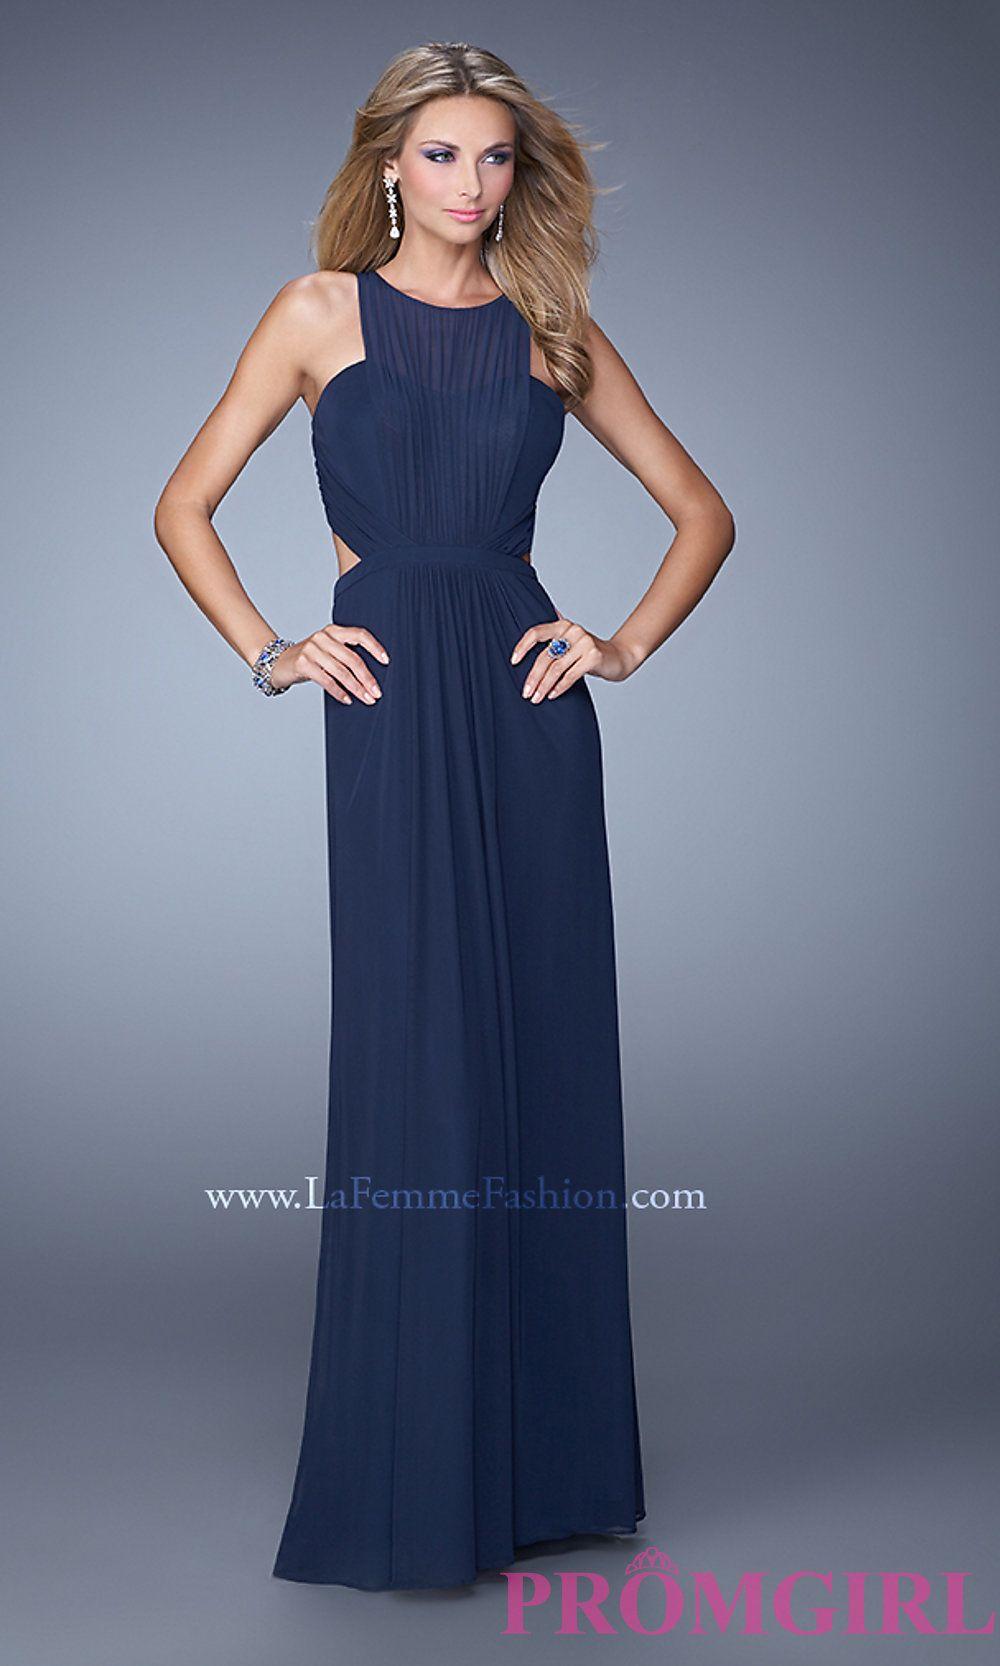 La Femme Long High Neck Prom Dress LF-21187 | Prom 2016: La Femme ...